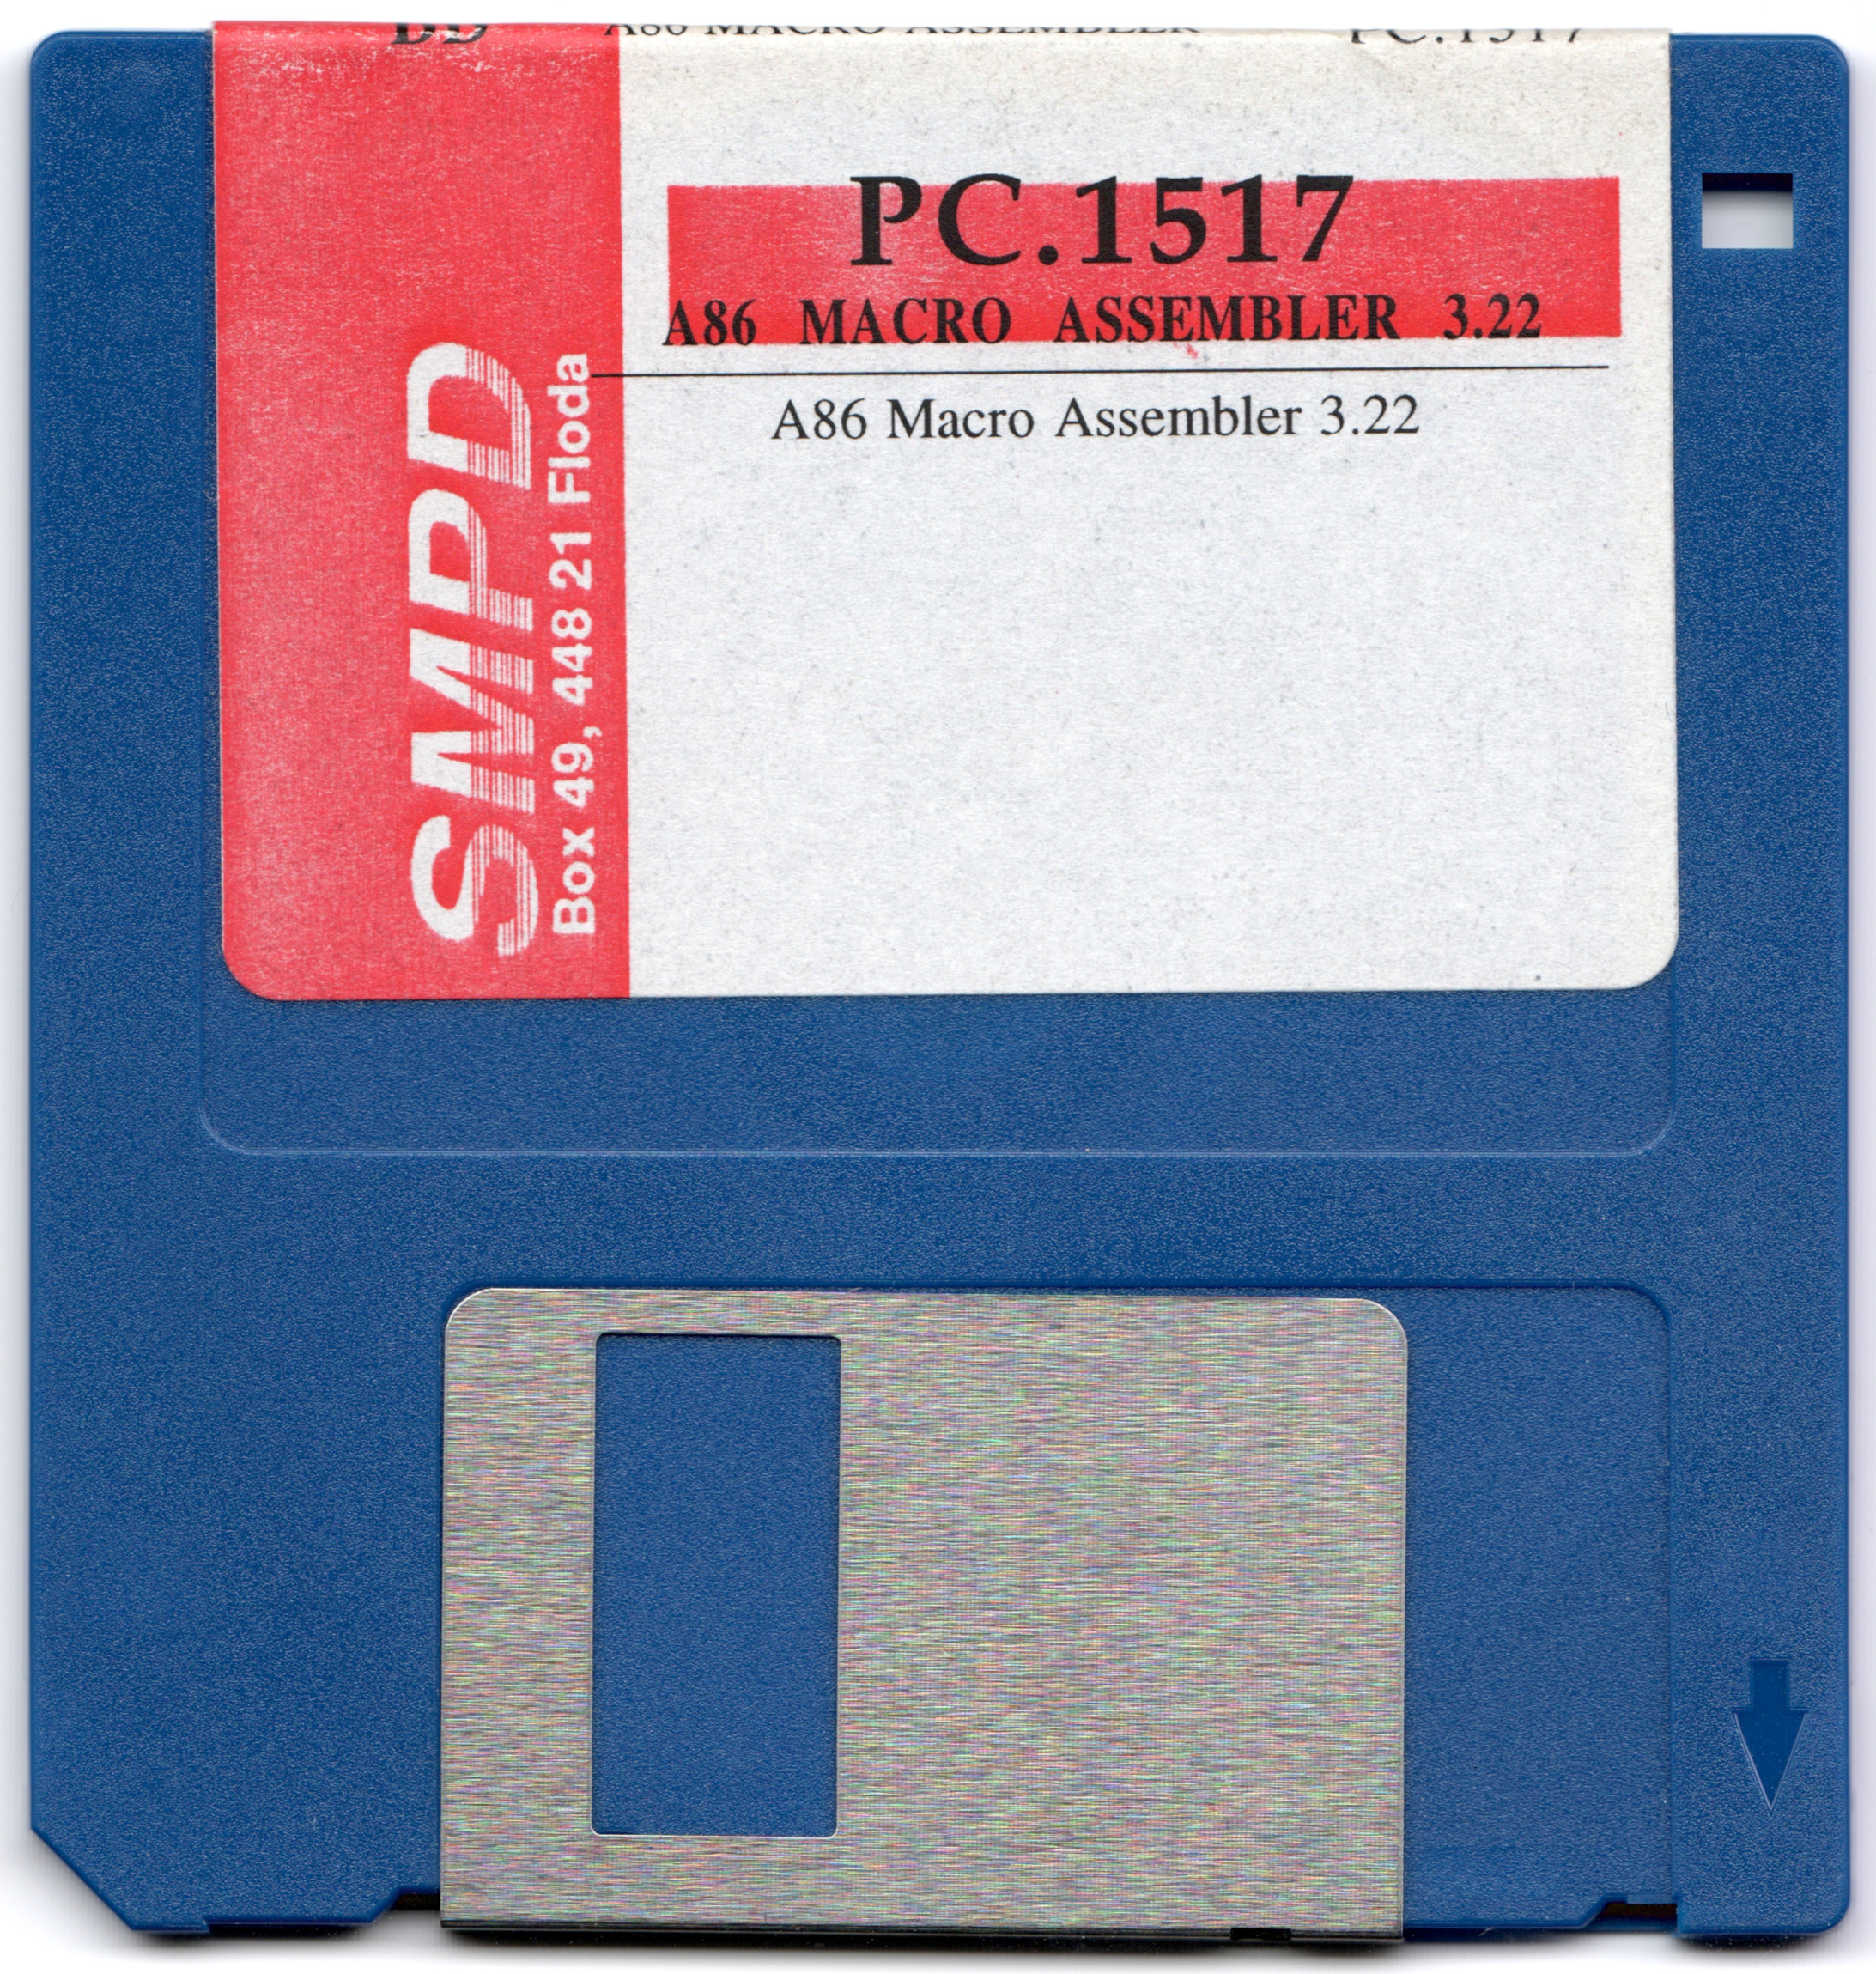 SMPD PC.1517 A86 Macro Assembler 3.22